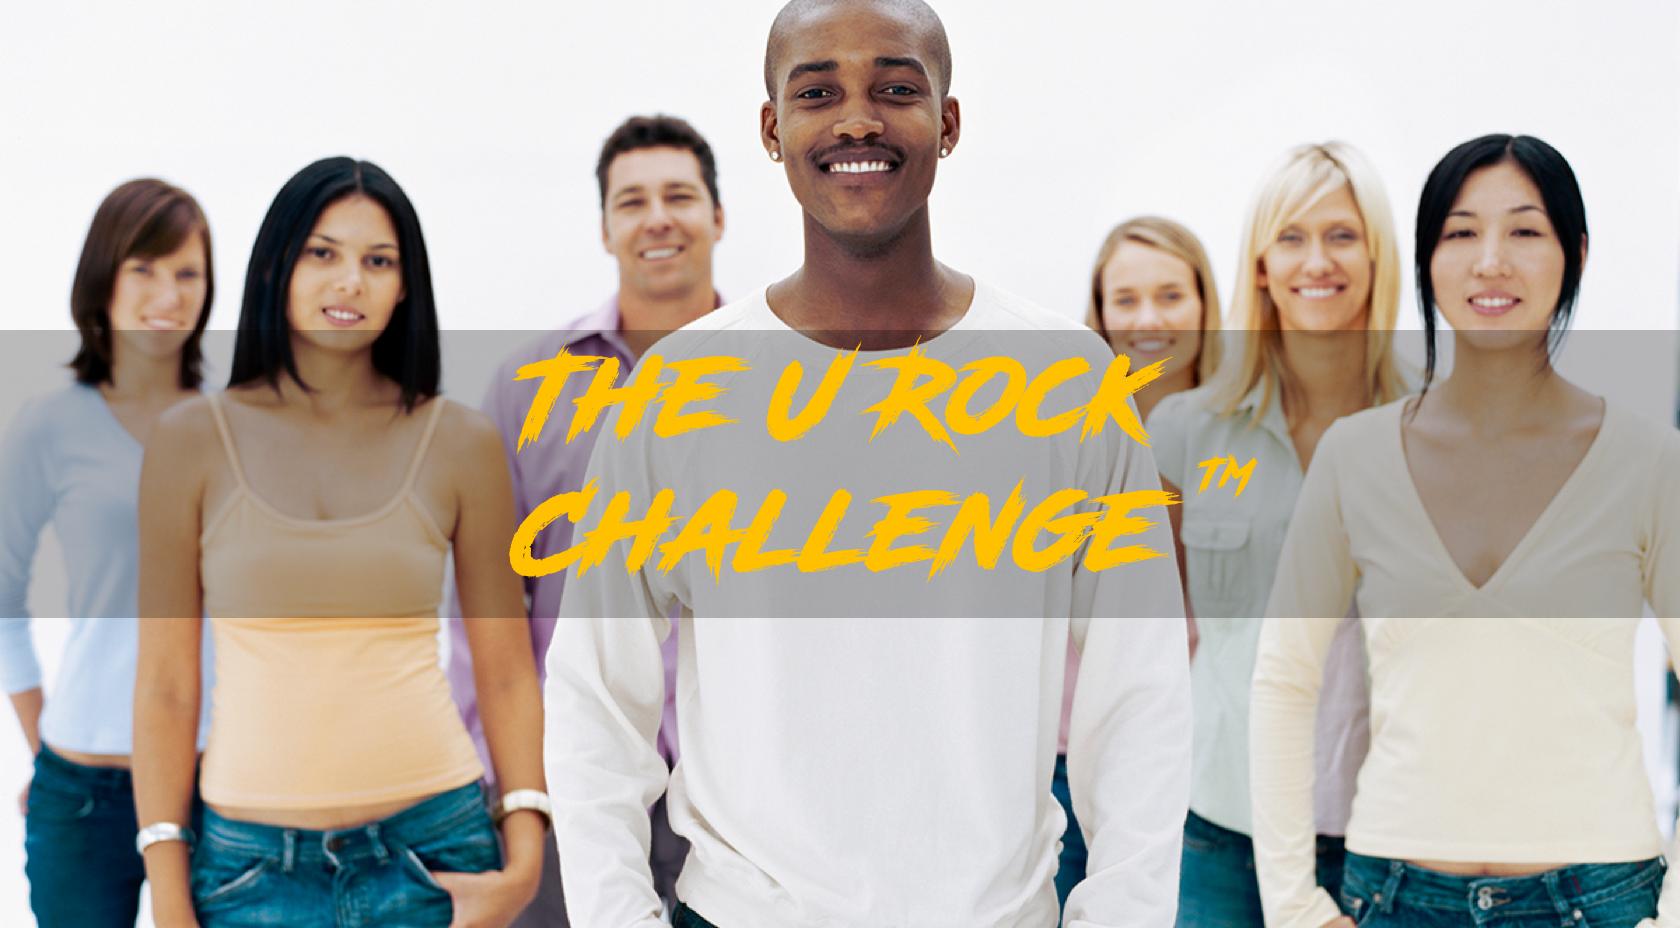 U Rock Challenge cover.png